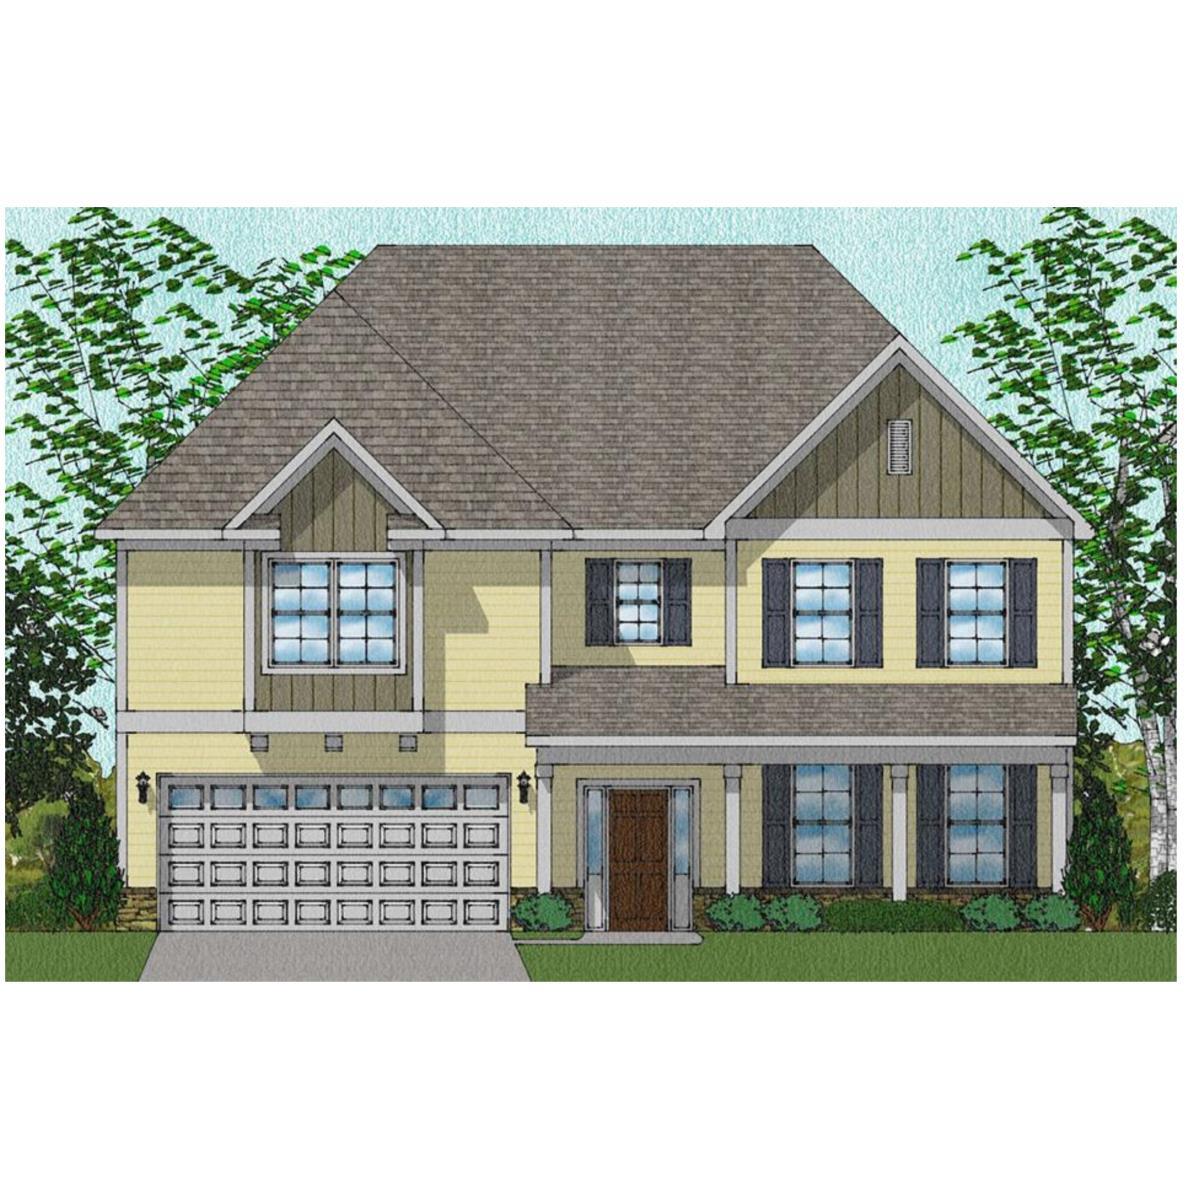 The Yates – Mungo Homes Yates Floor Plan